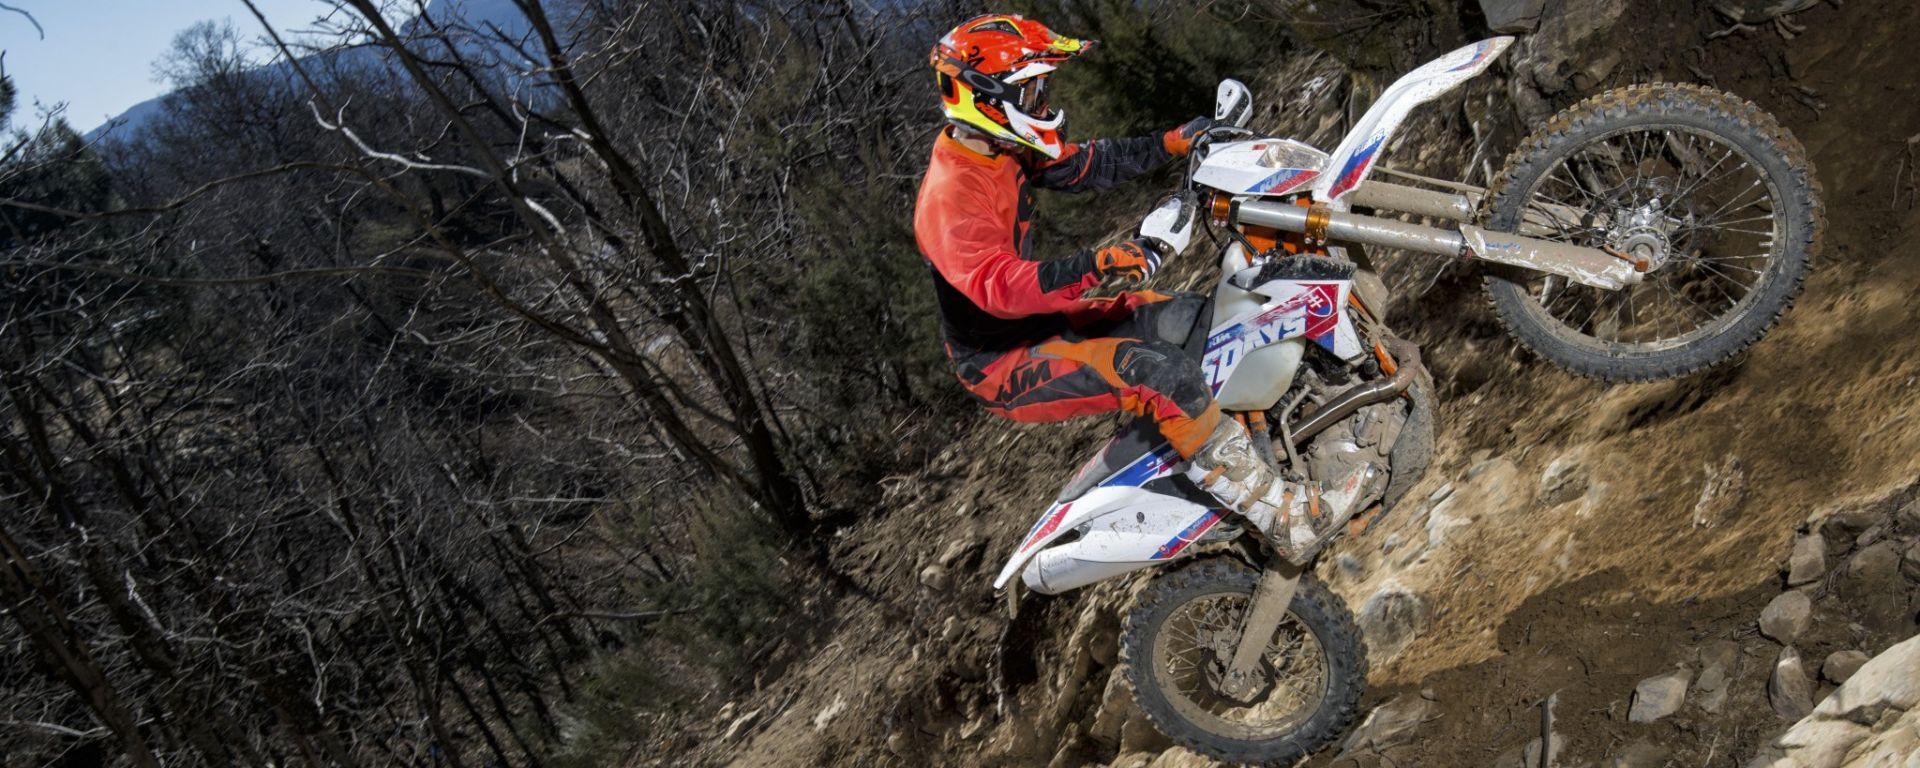 KTM Muddy Winter